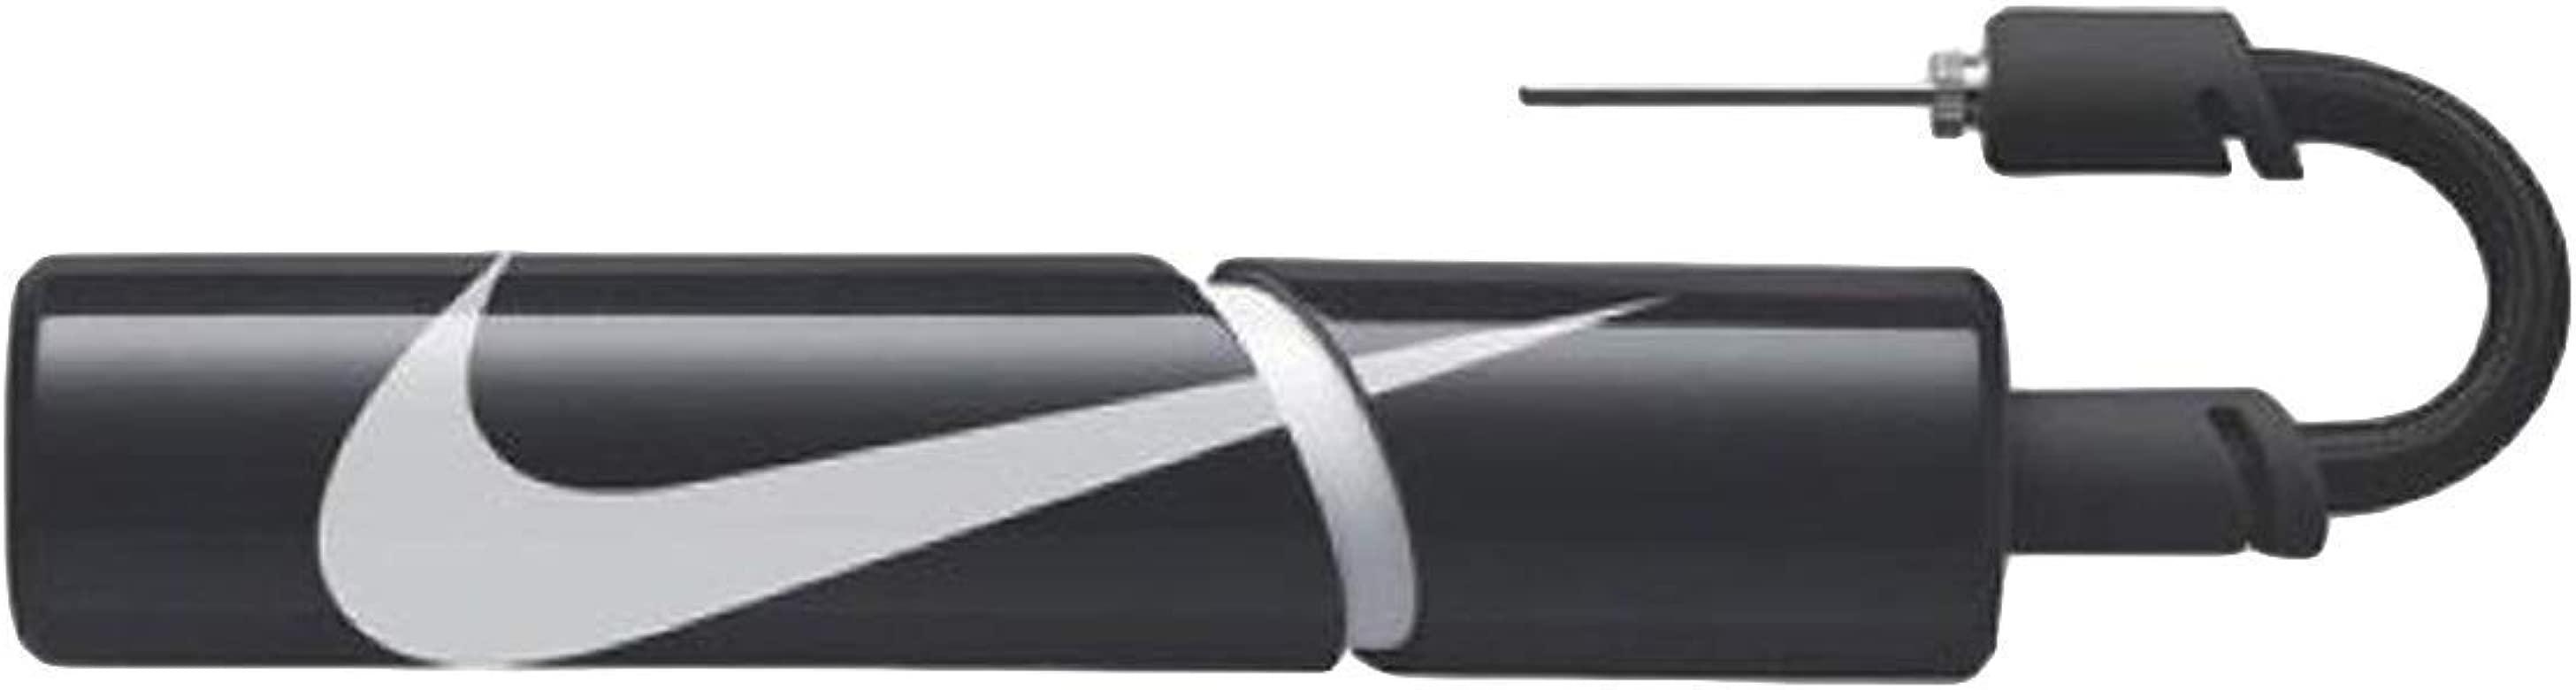 Nike Essential Ball Pump Infladores Fútbol Unisex Adulto ...